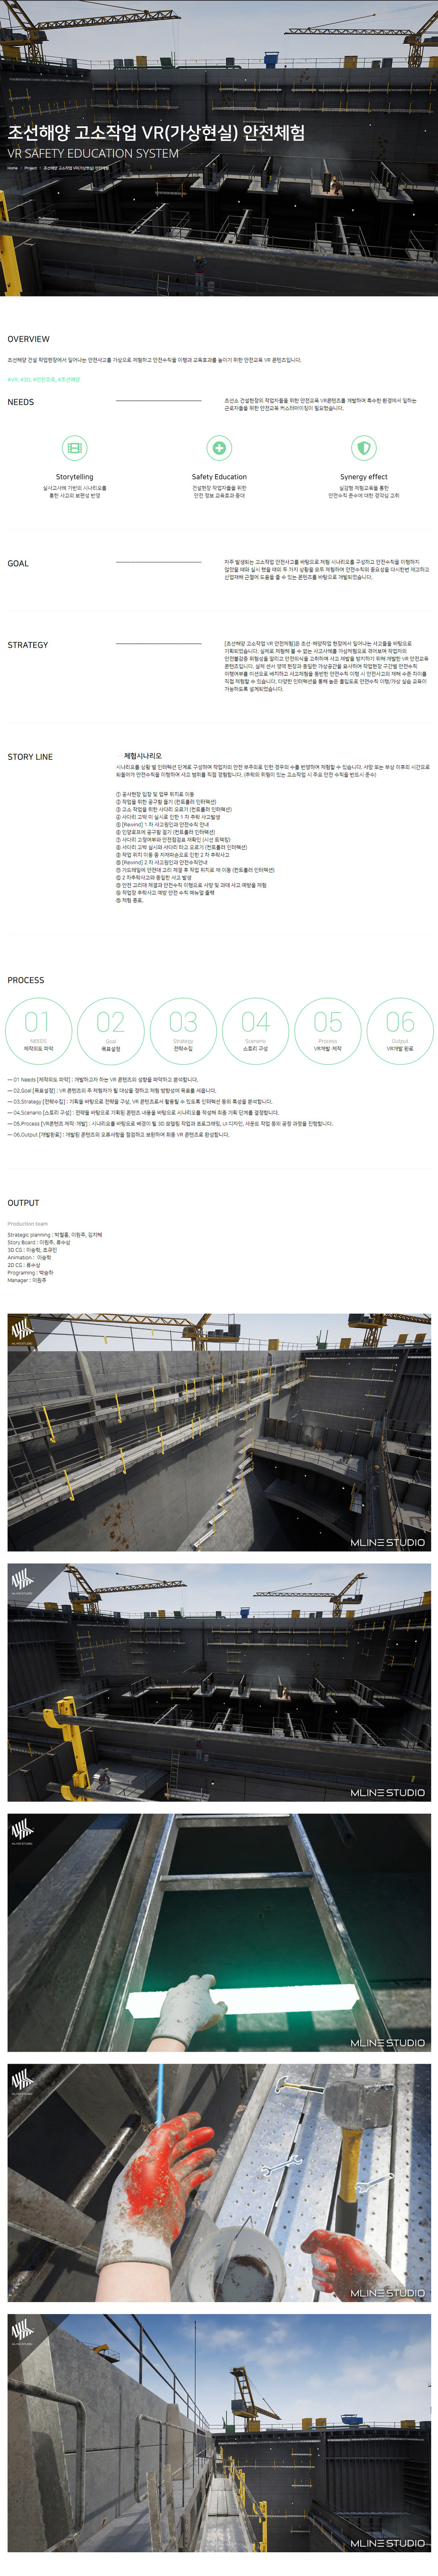 screencapture-m-line-tv-project-20180502